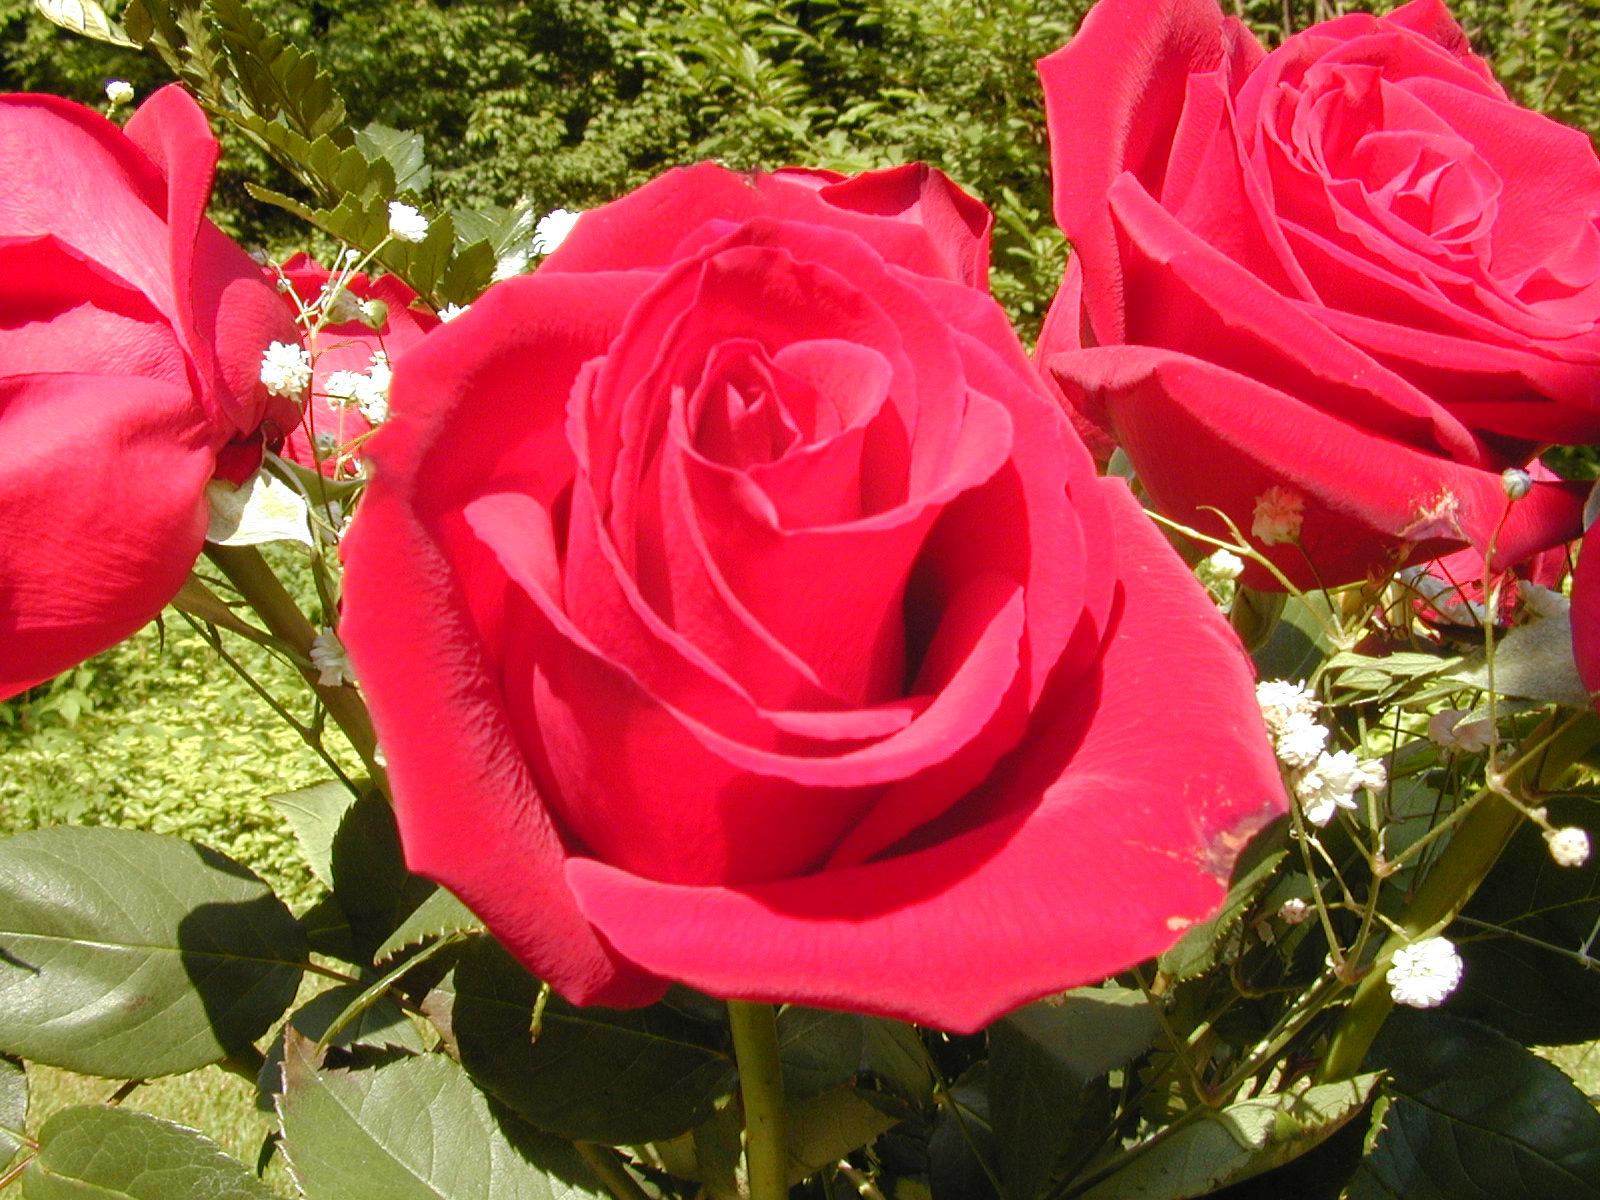 Beautiful Wallpapers Free Hd Roses Beautiful Pictures For Desktop